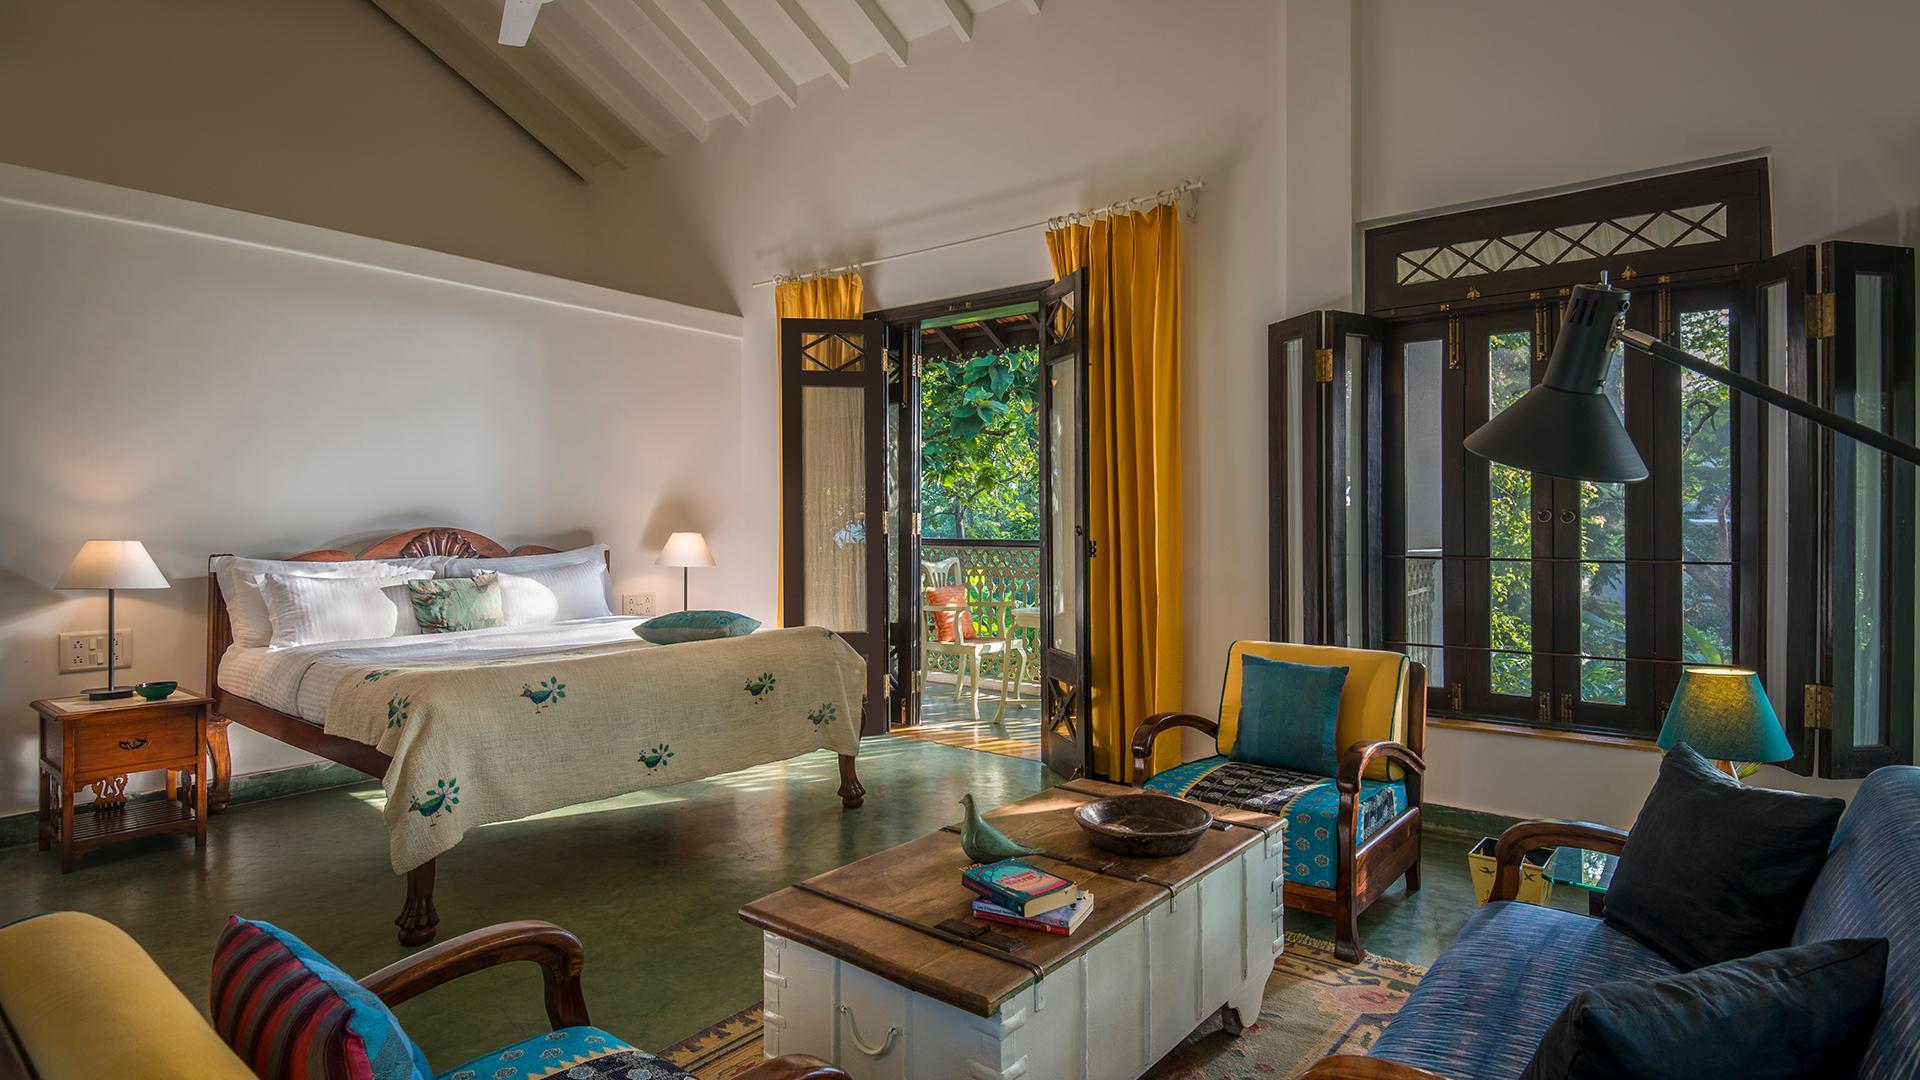 Banyan Room image 1 at The Postcard Velha 2019 by North Goa, Goa, India